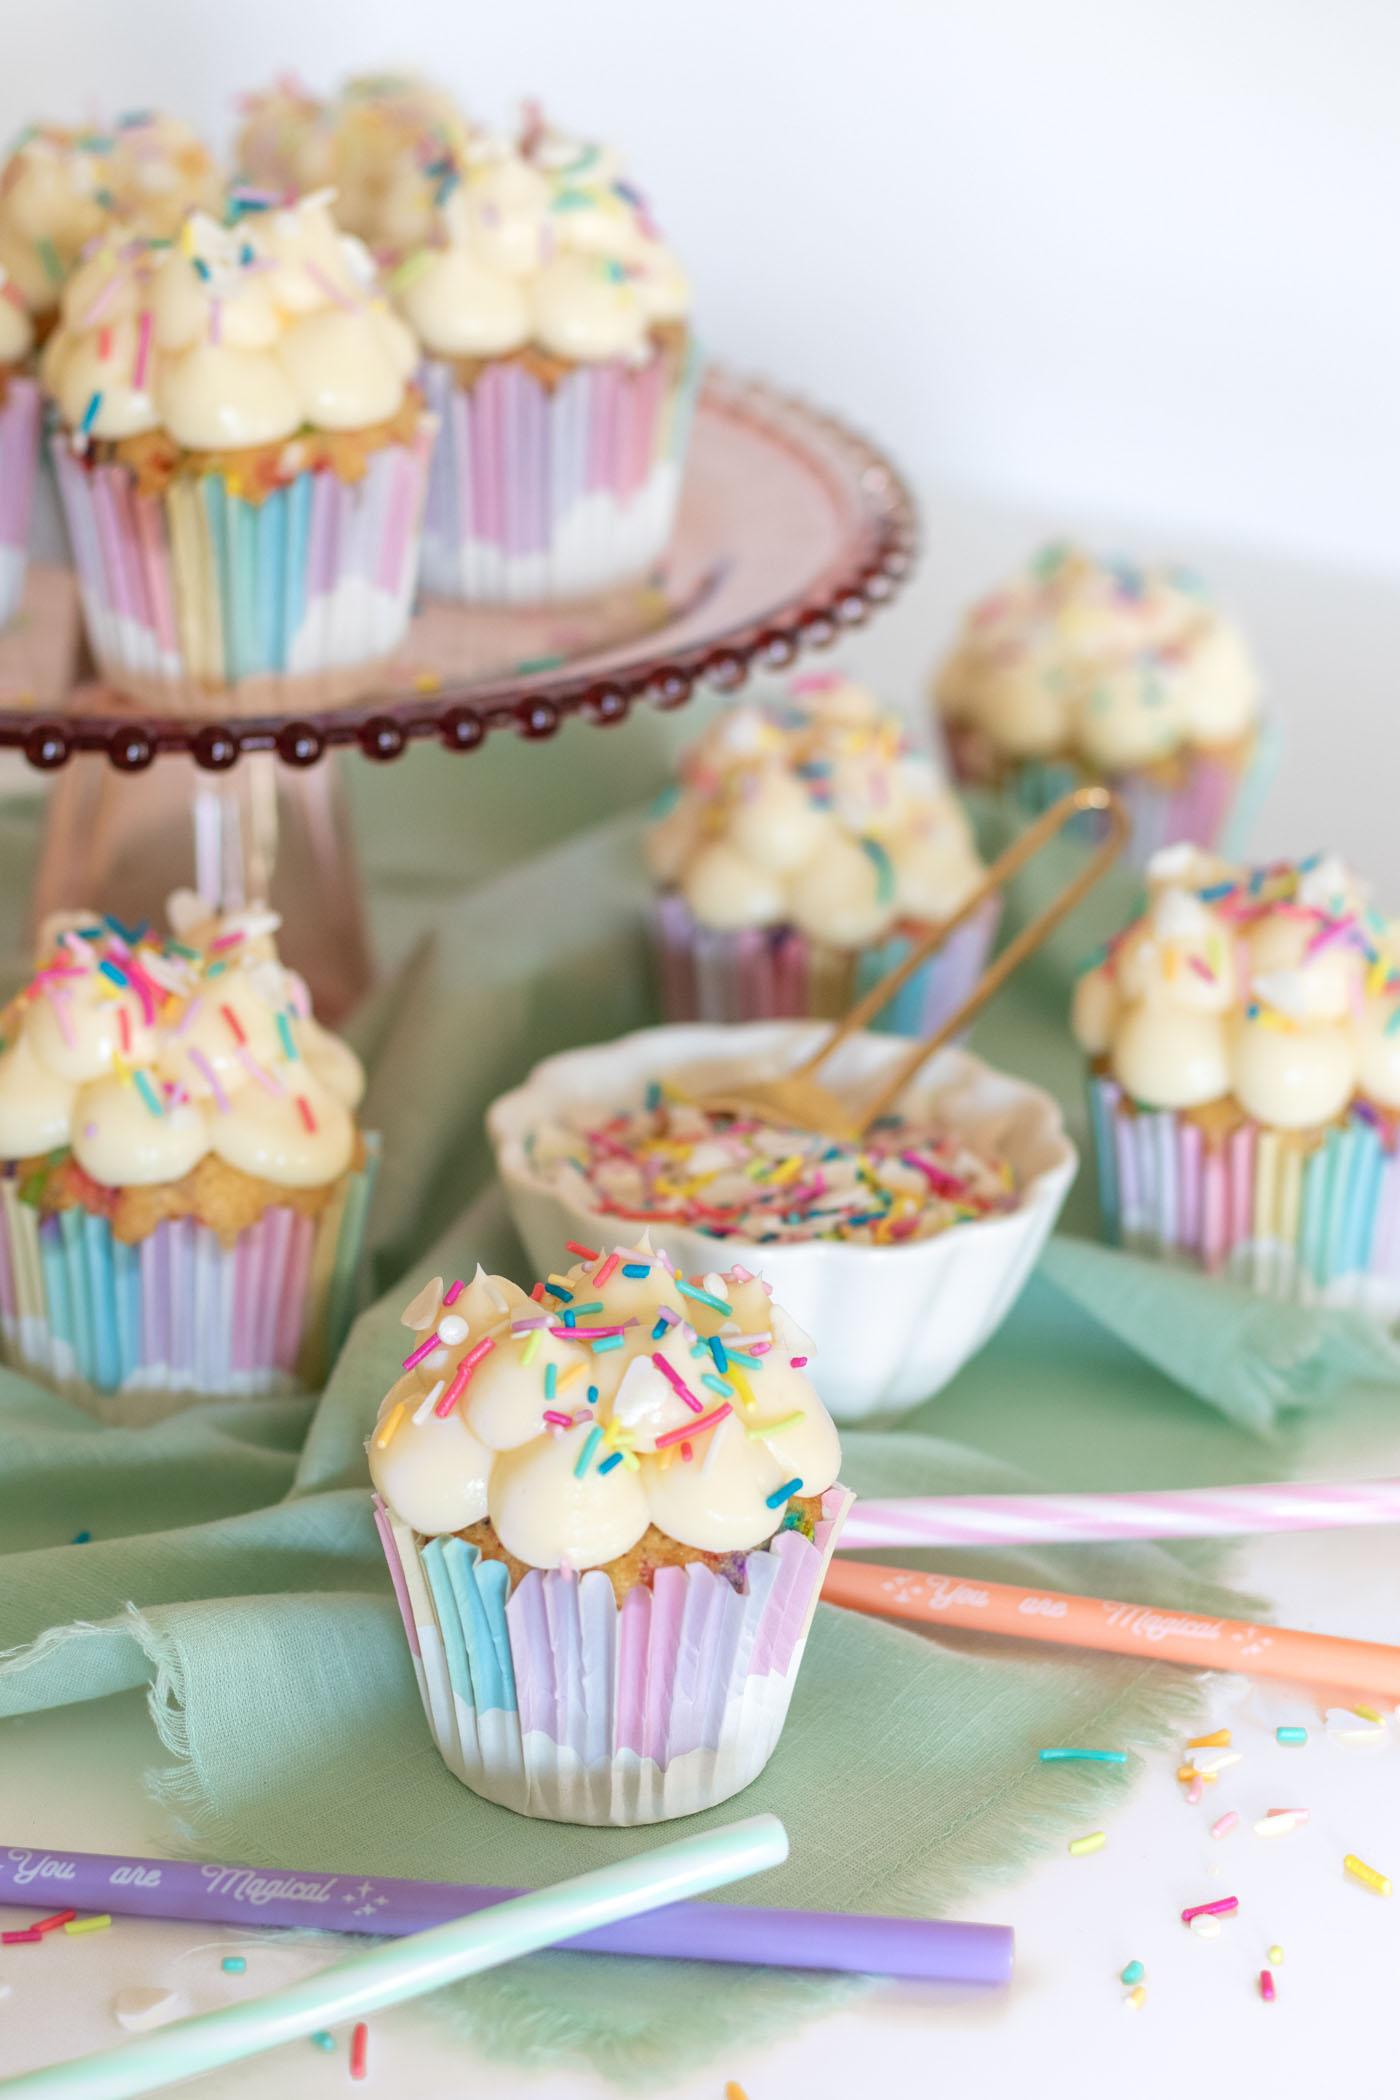 Magical Funfetti Cloud Cupcakes   Club Crafted